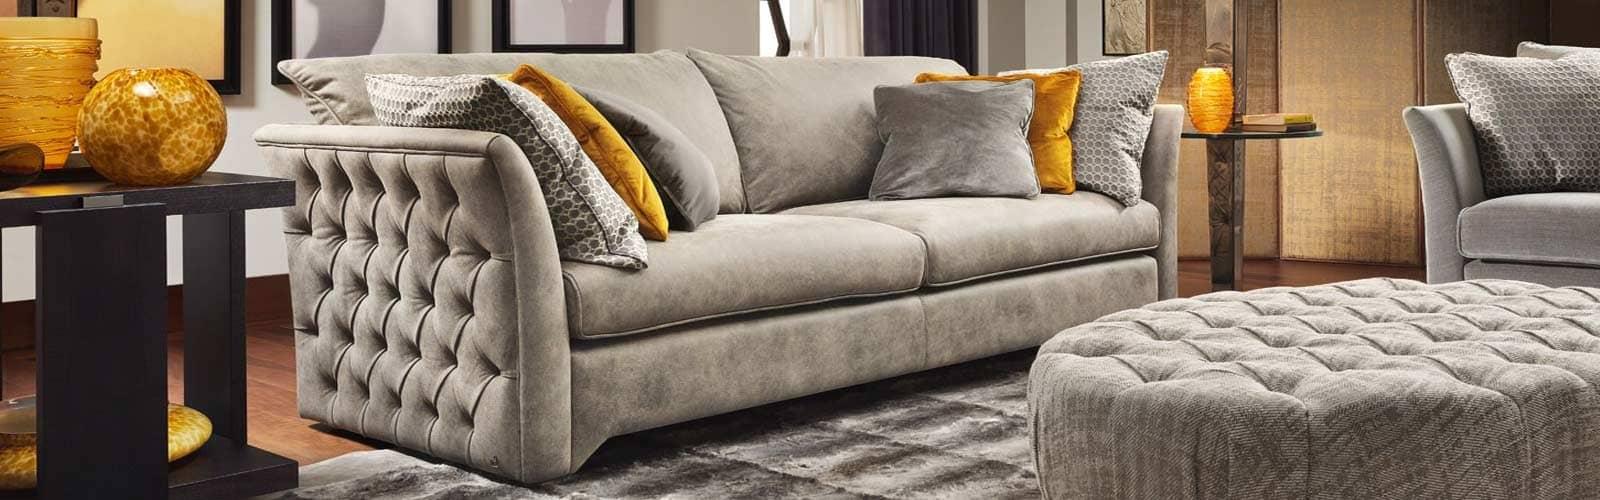 arredamento-calabria-divani